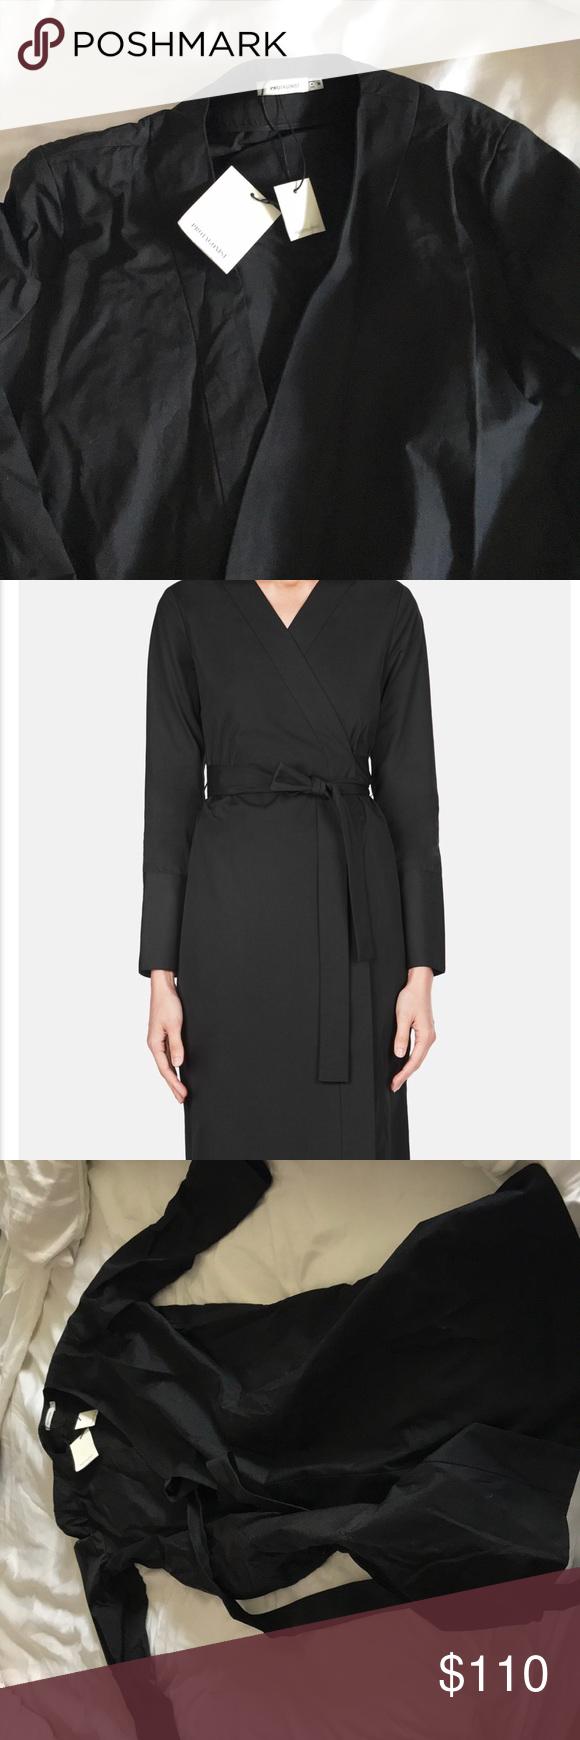 Black wrap dress cotton nwt wrap dresses dresses dresses and wraps